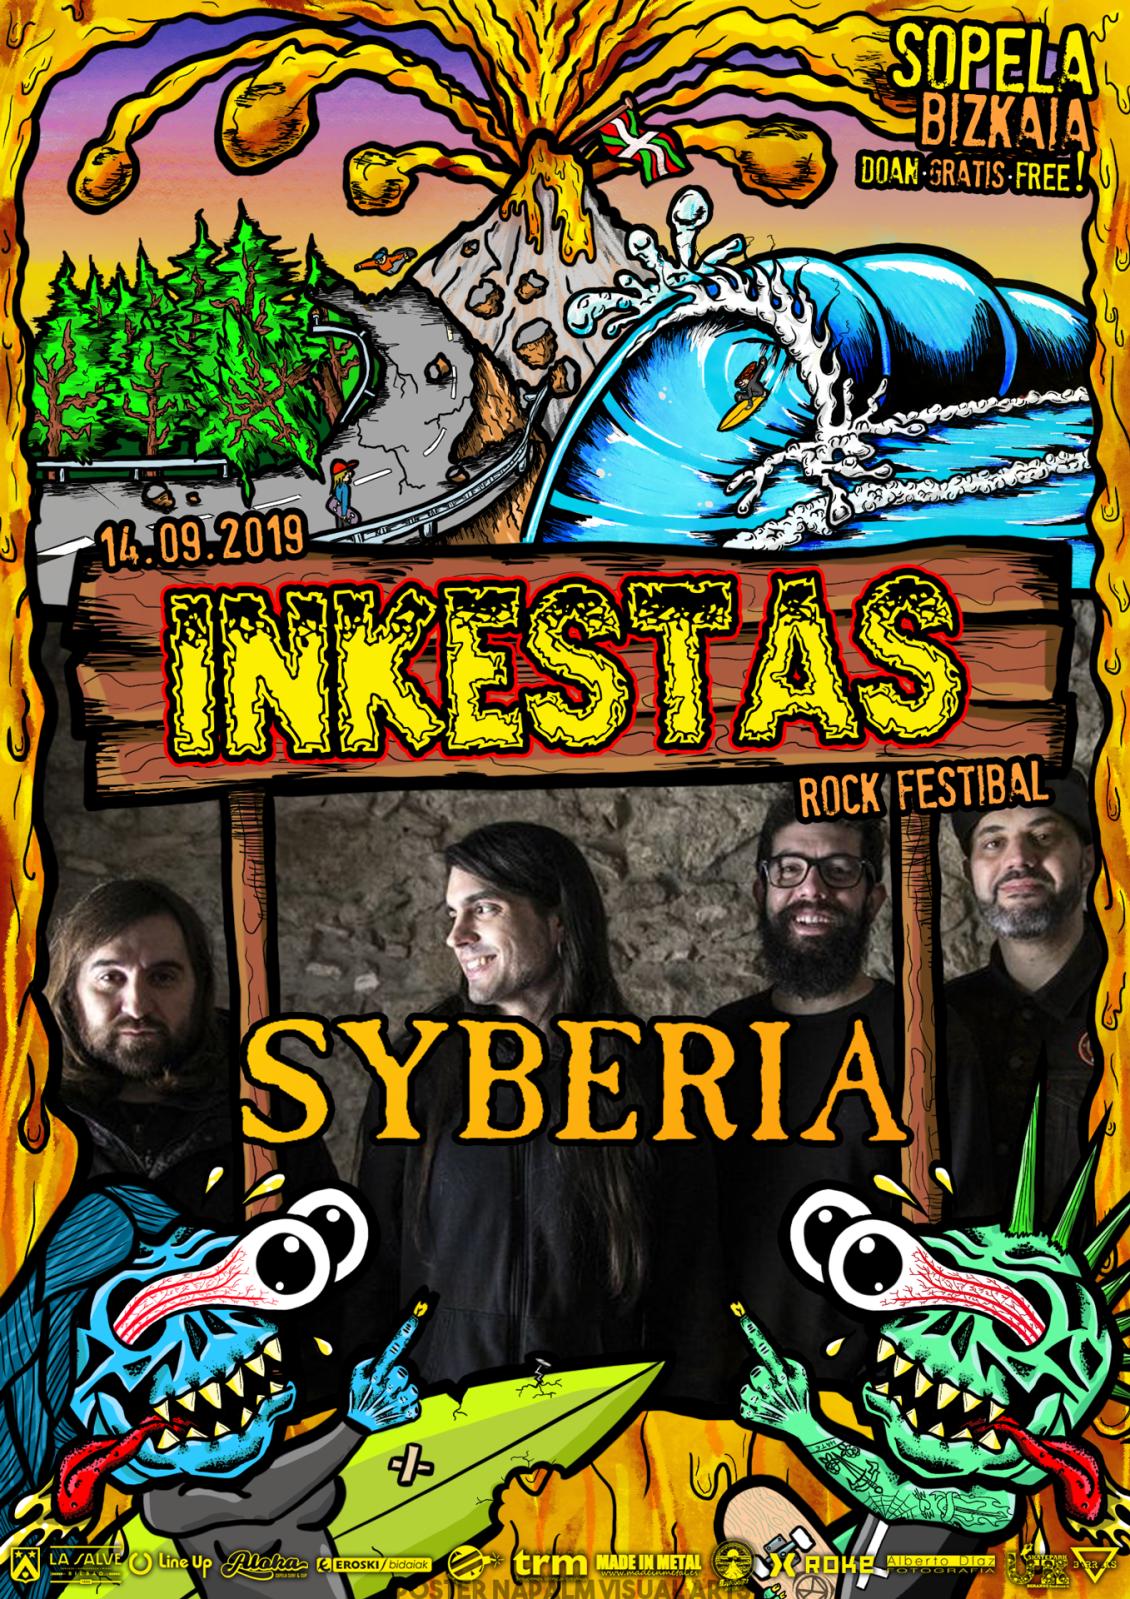 INKESTAS ROCK FESTIBAL 2019 315yec6